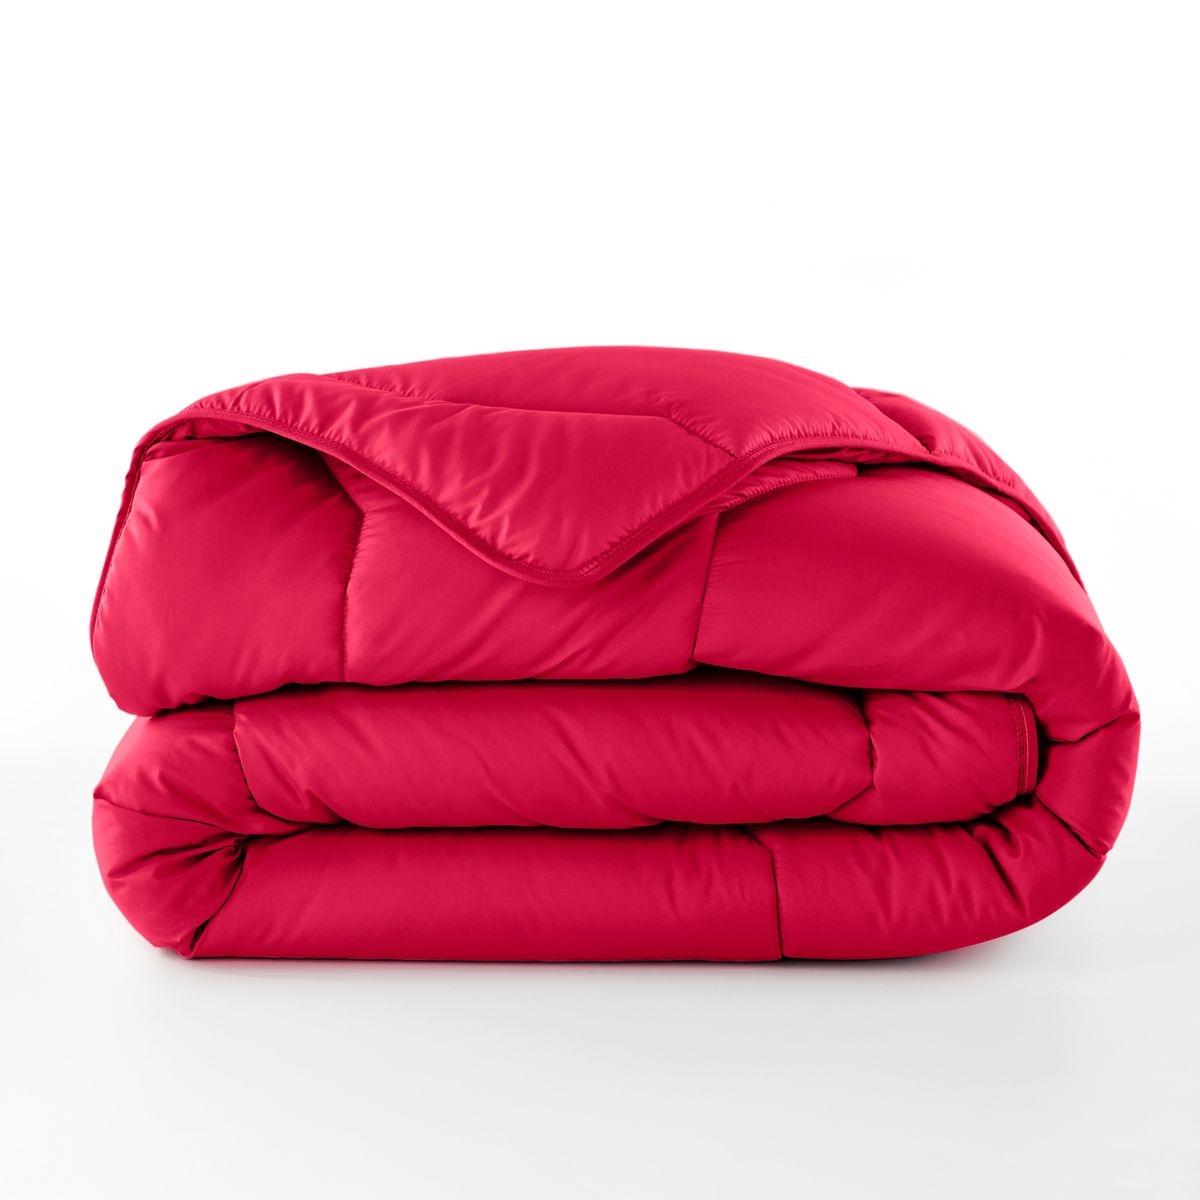 Couette 100% polyester, qualité normale, 300 gr/m²